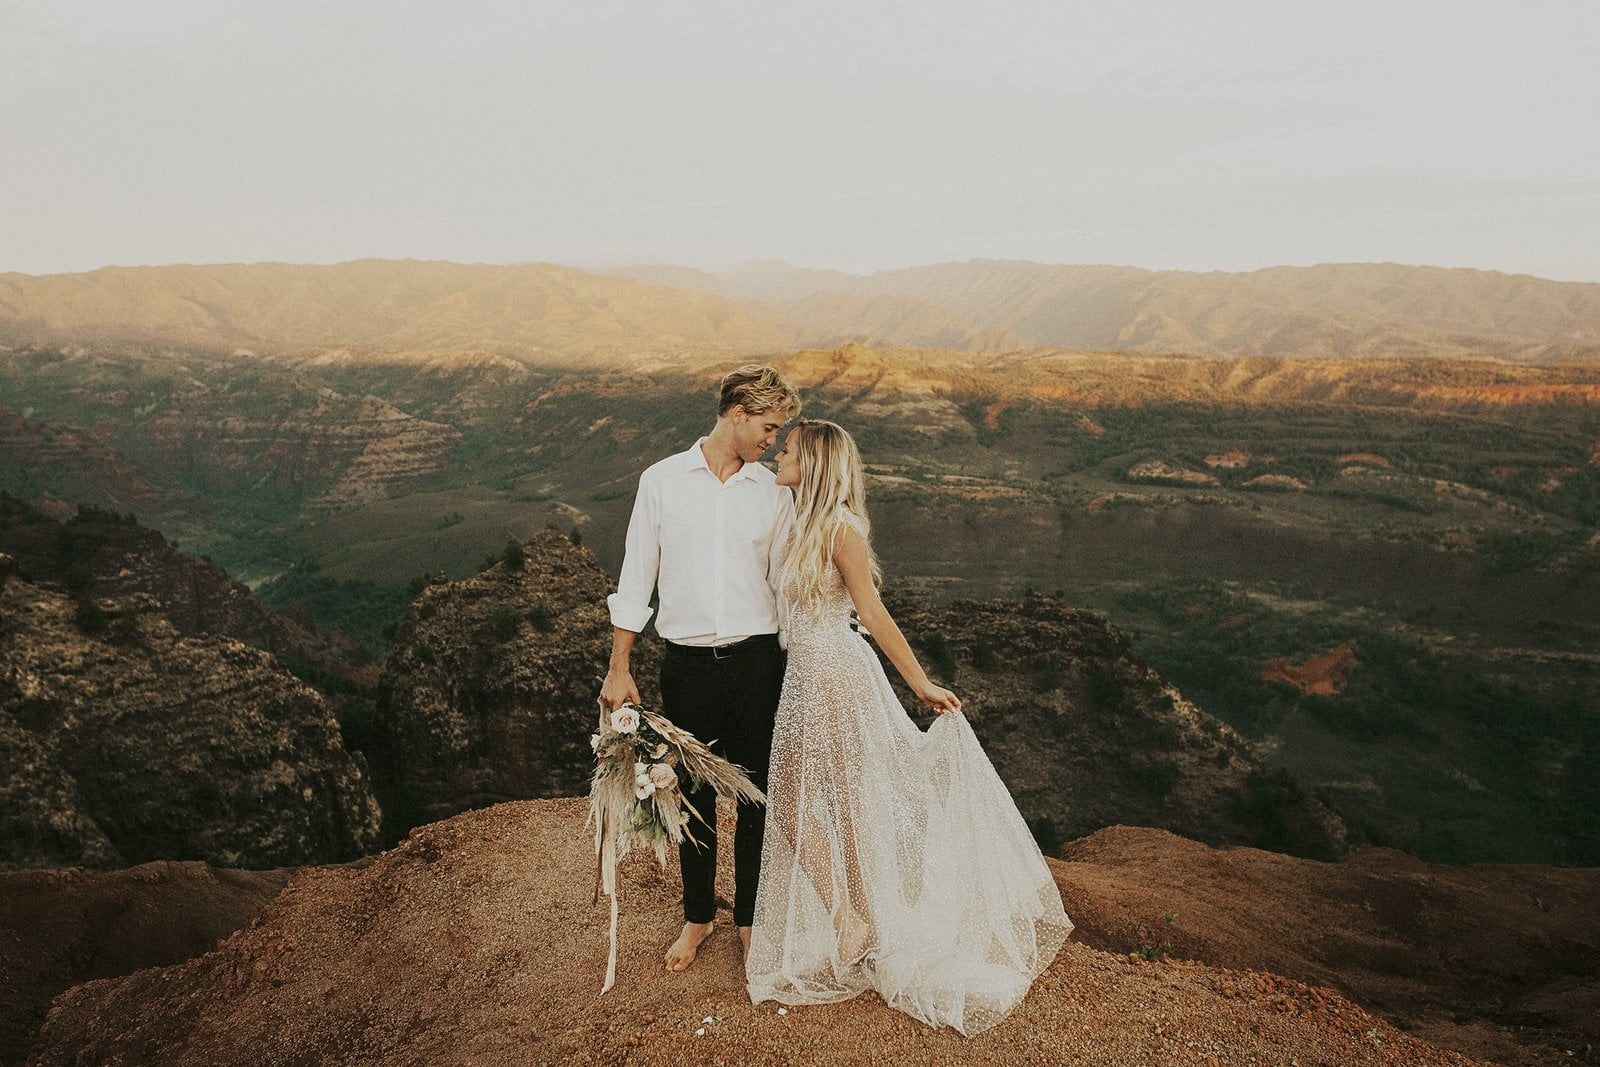 bride and groom taking wedding photos at kauai waimea canyon